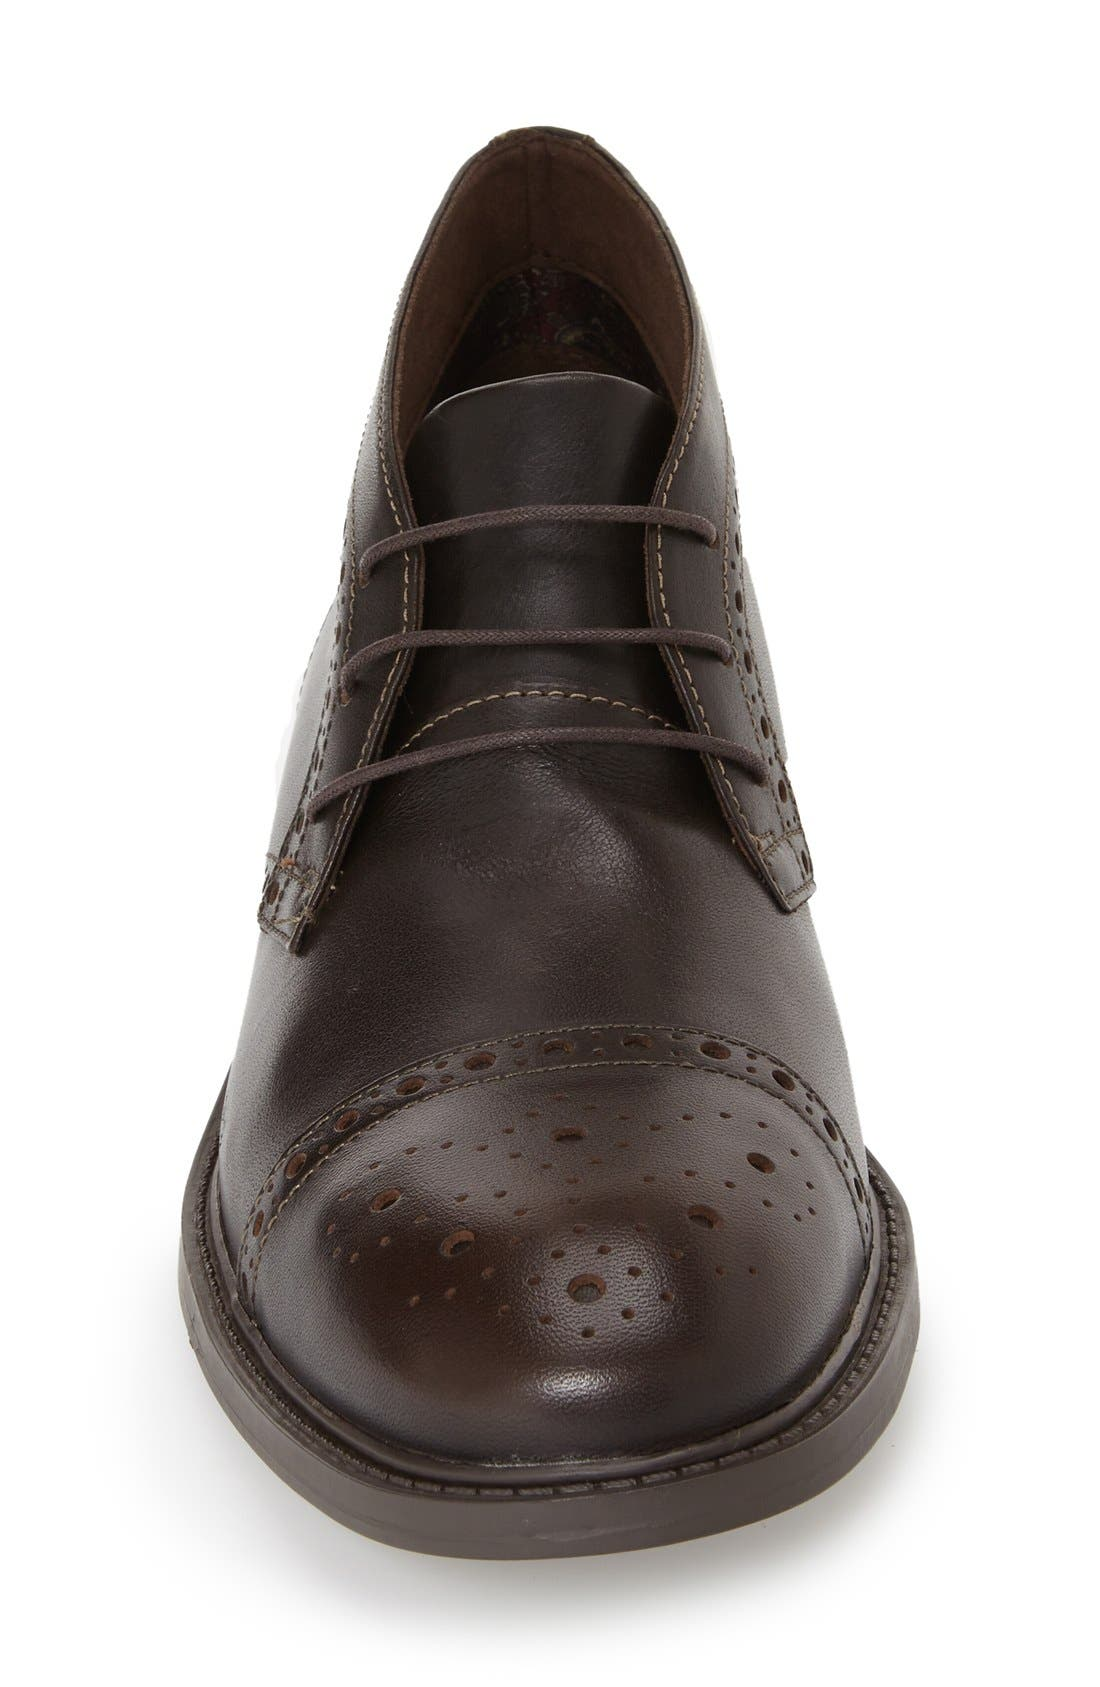 'Gavin' Chukka Boot,                             Alternate thumbnail 3, color,                             Brown